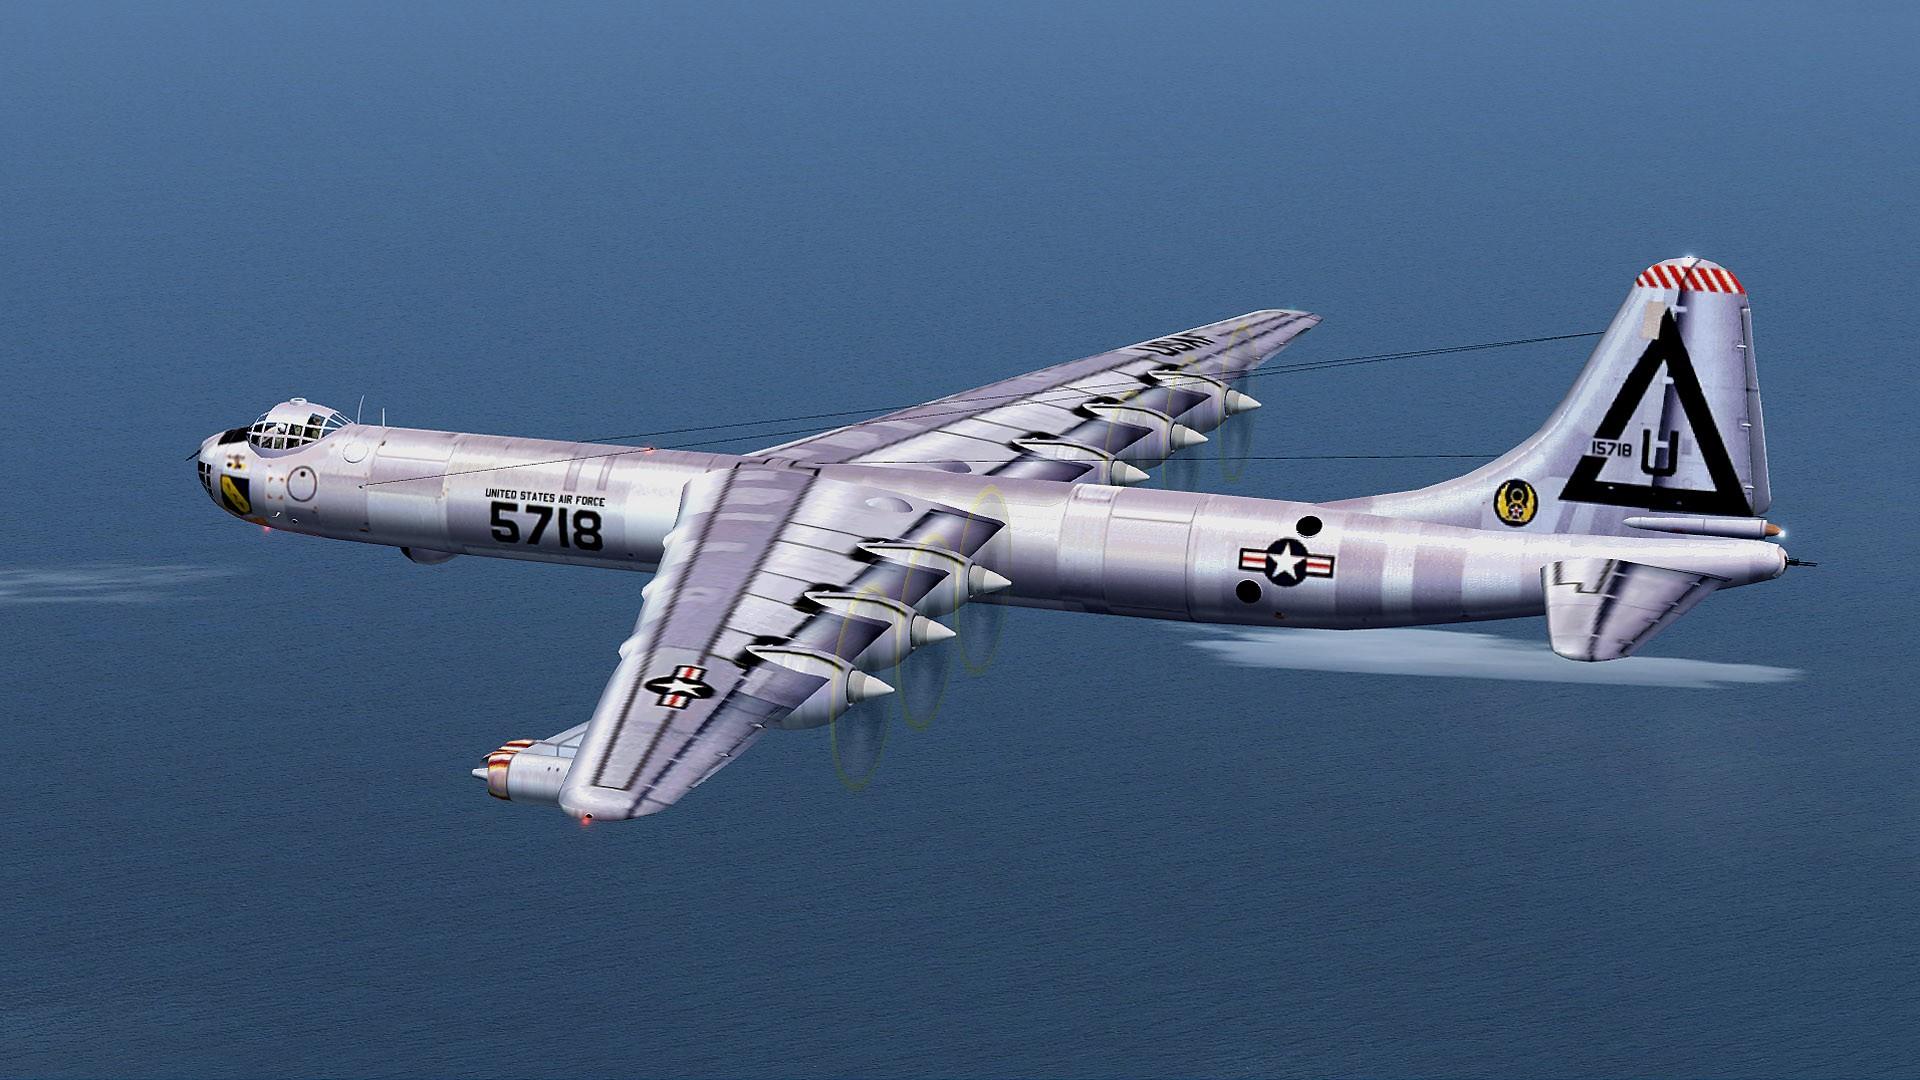 Flight Simulator 2004 wallpaper 1920x1080 220746 WallpaperUP 1920x1080